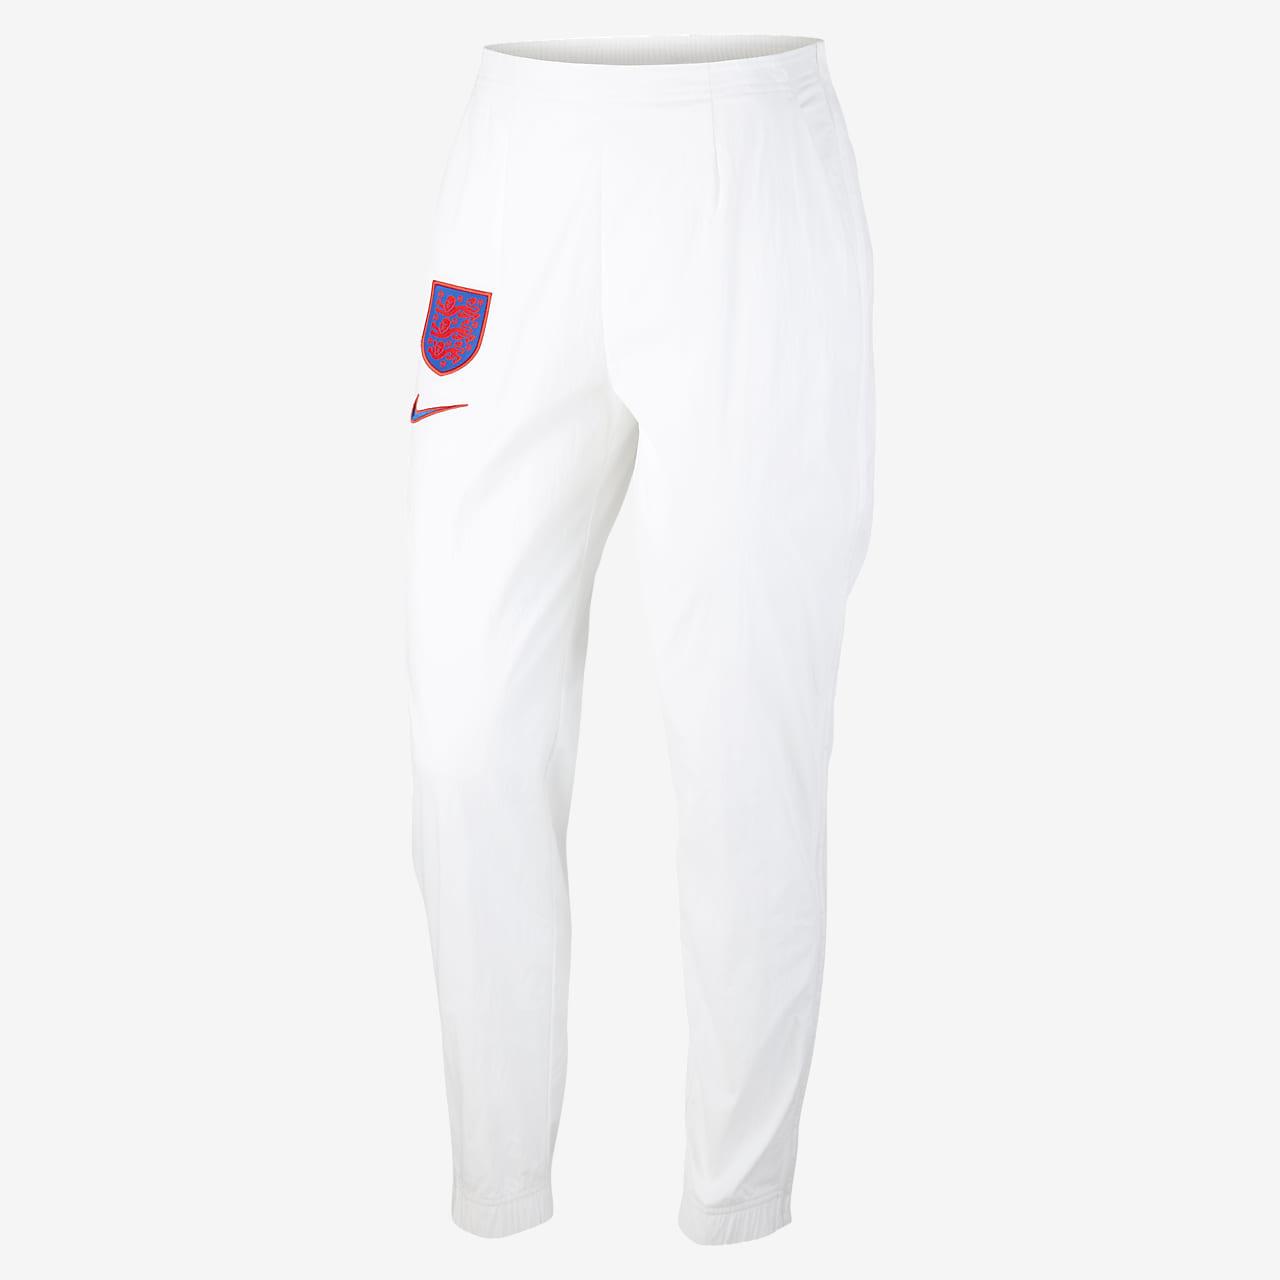 Damskie spodnie piłkarskie z tkaniny Anglia